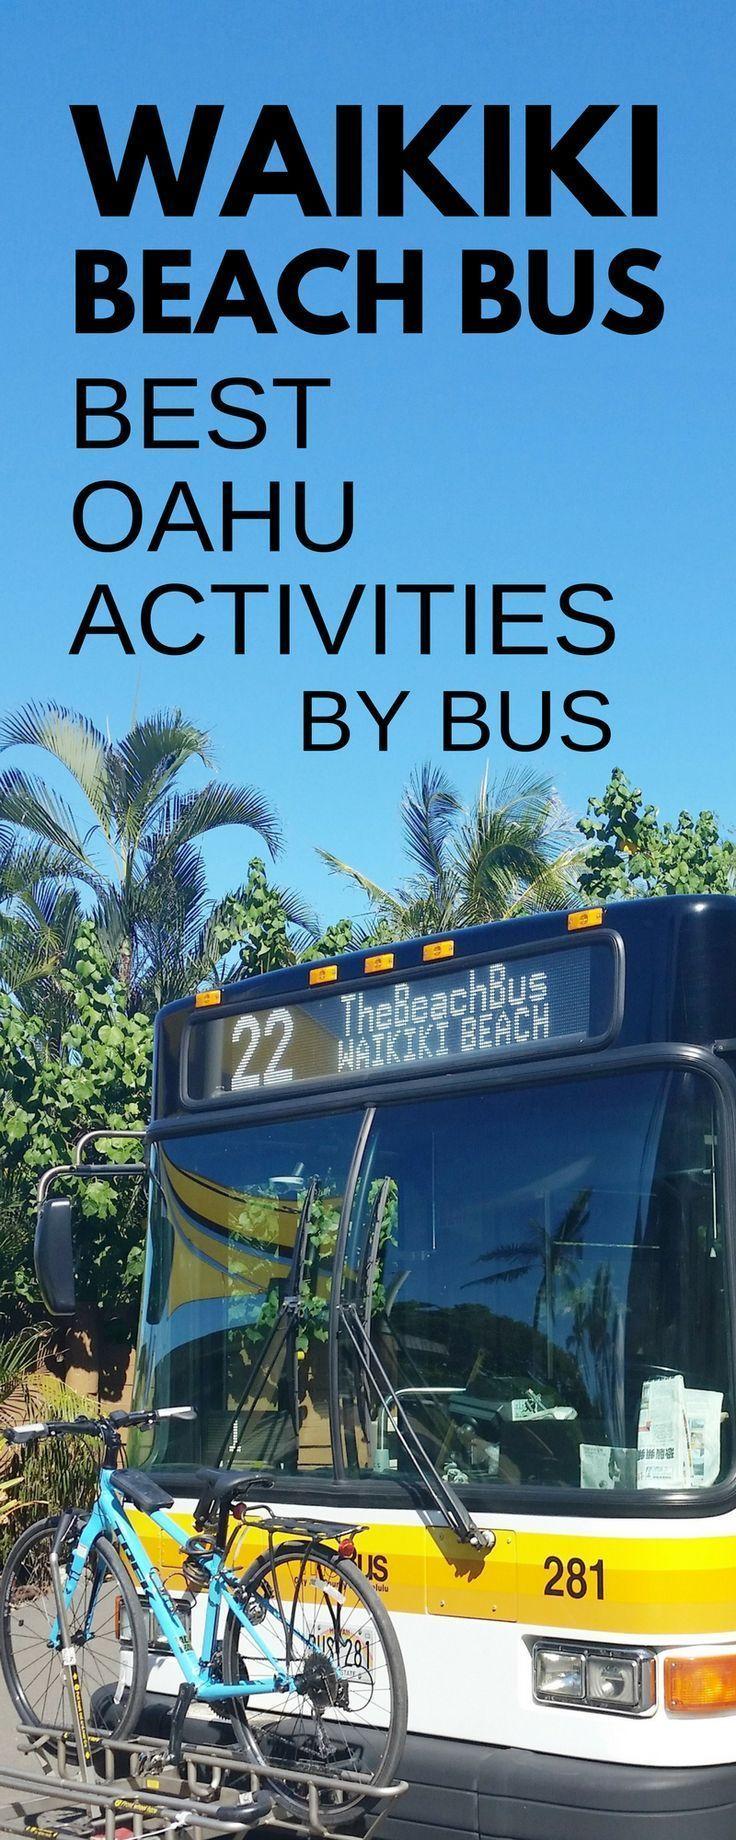 Getting Around Waikiki By Bus Things To Do Near Waikiki Oahu